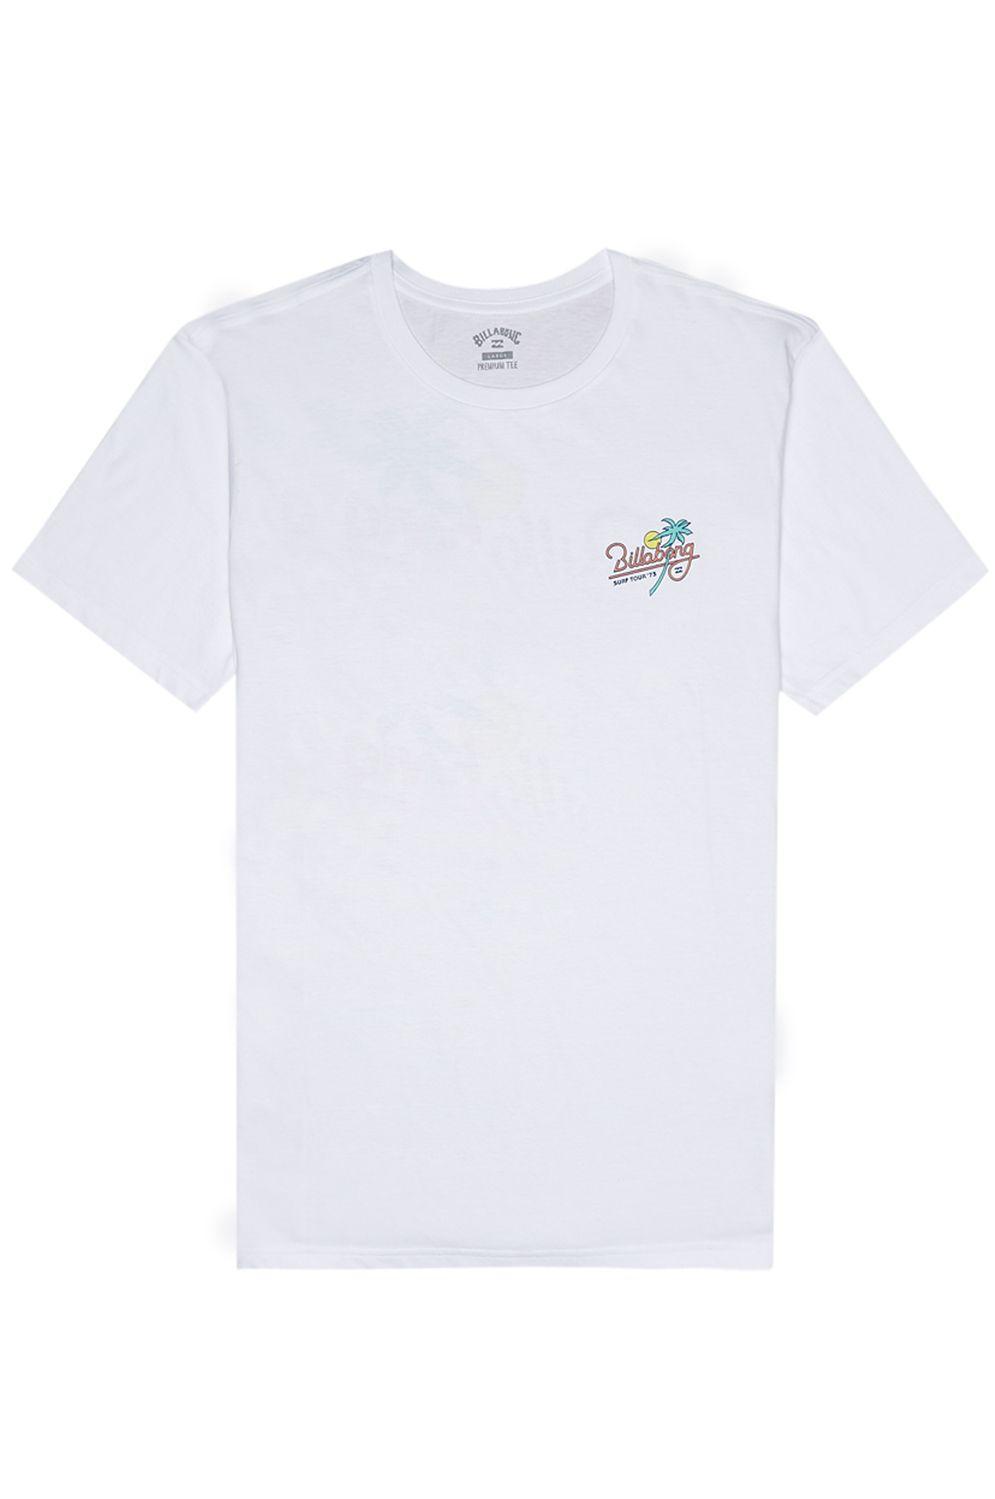 T-Shirt Billabong SURF TOUR White